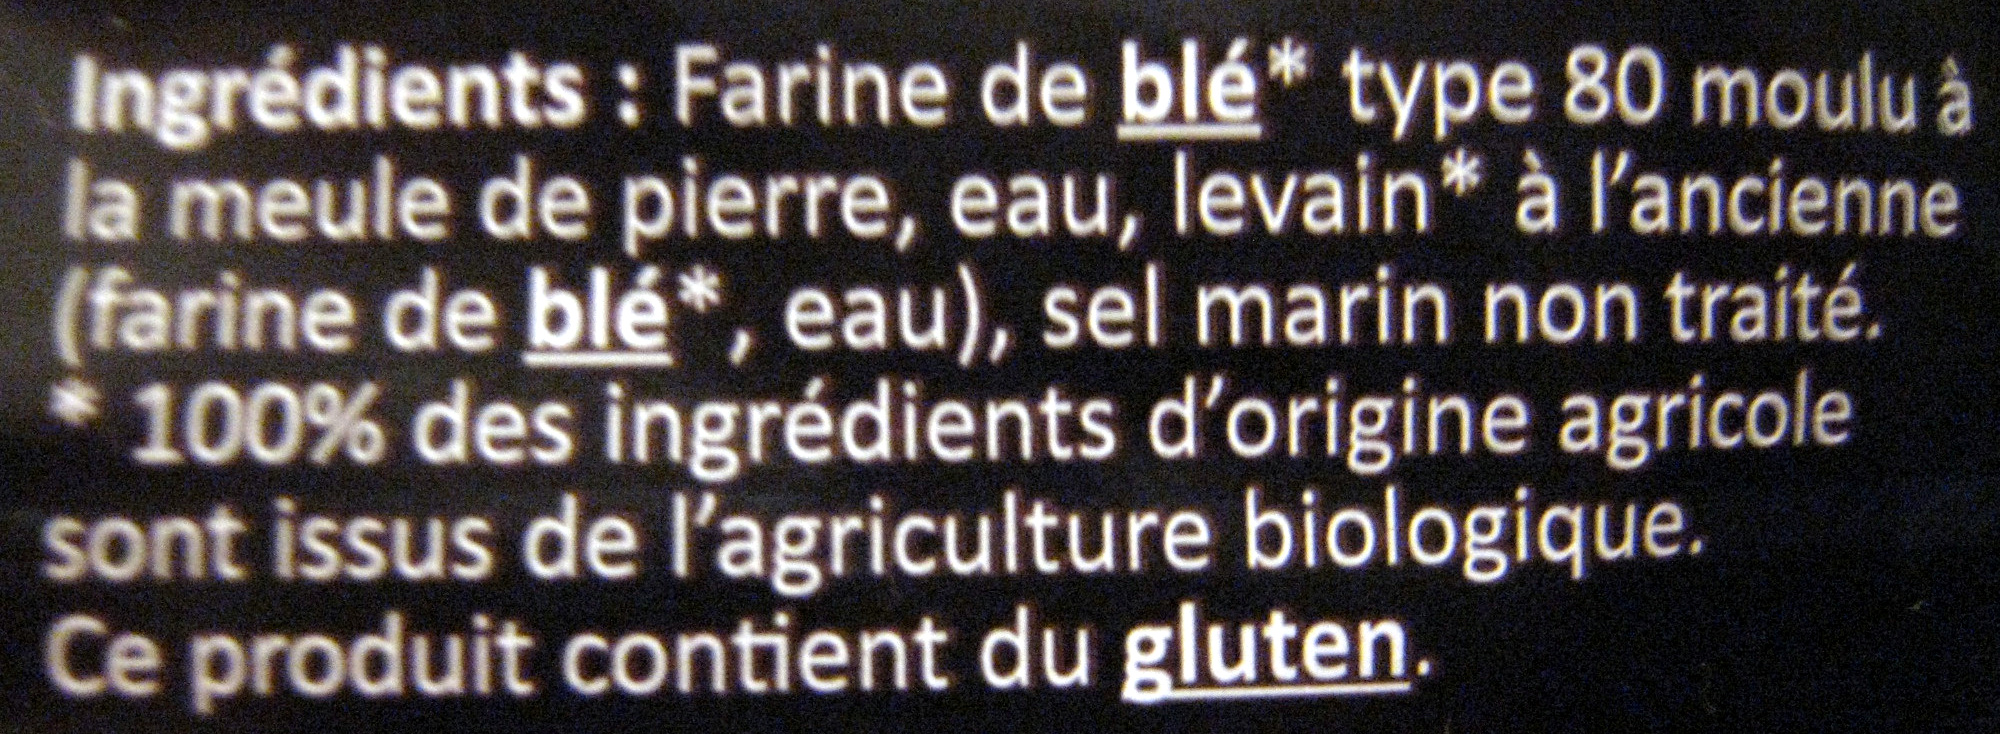 Pain rustique - Ingredients - fr